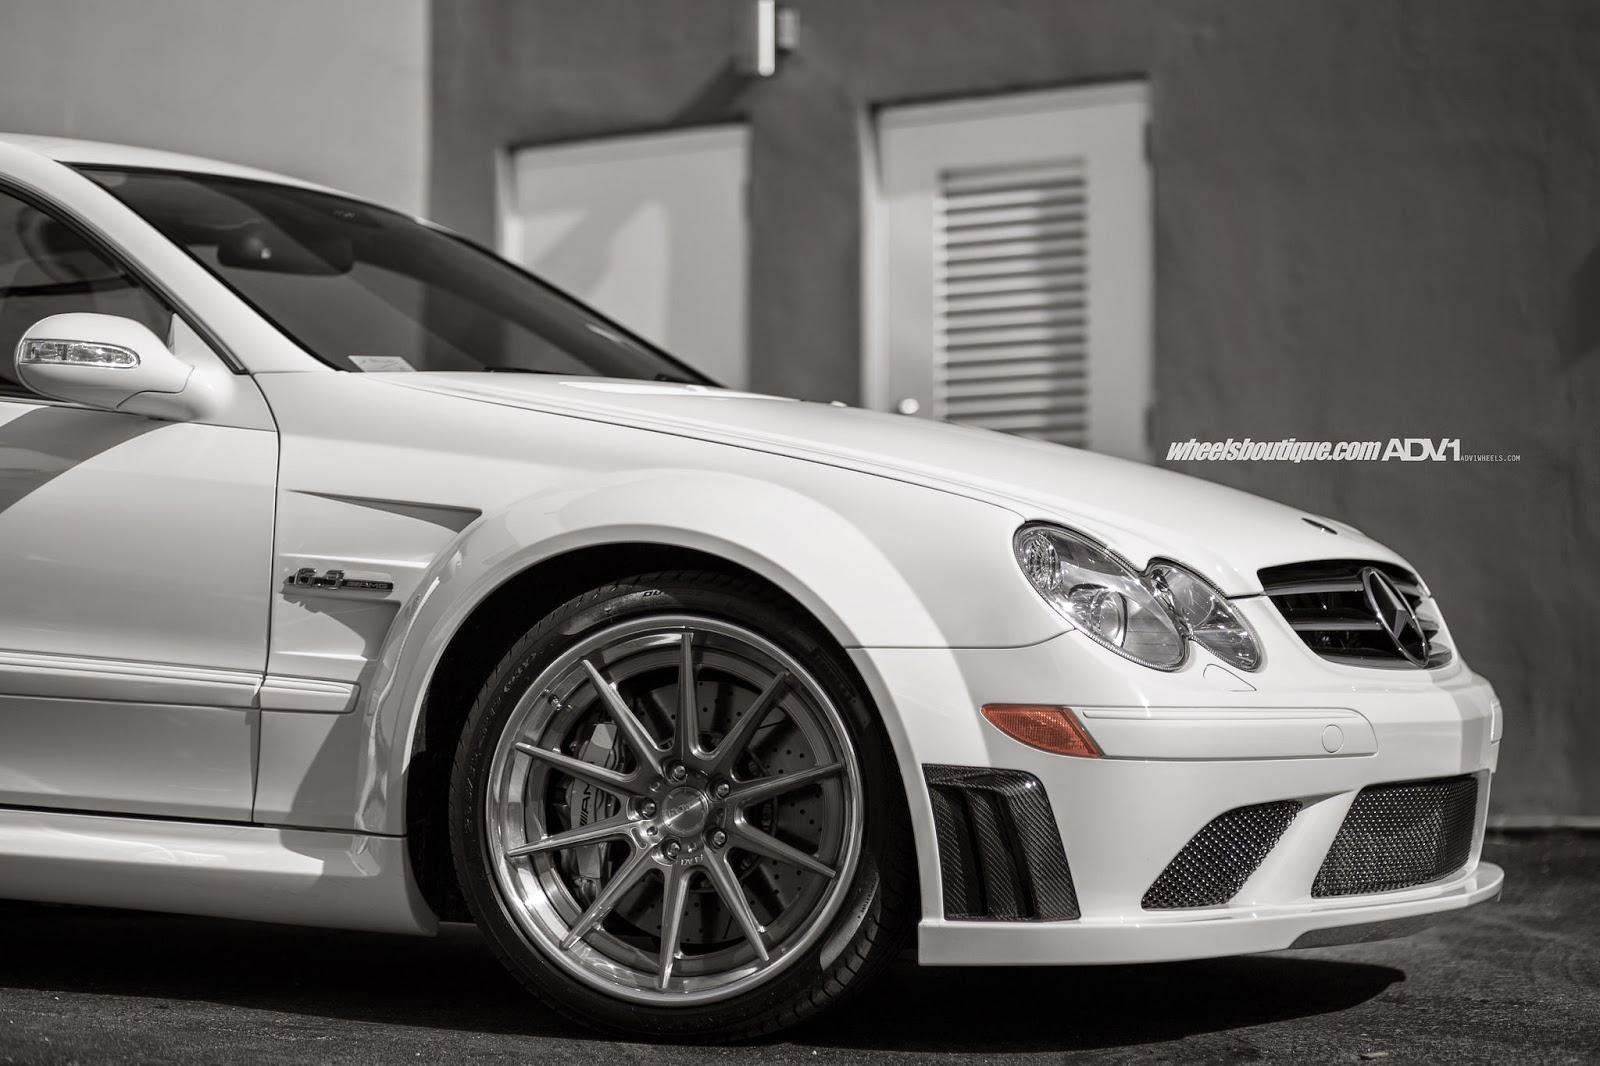 Custom Classic Car Wallpapers Mercedes Benz Clk63 Amg Black Series On Adv 1 Wheels